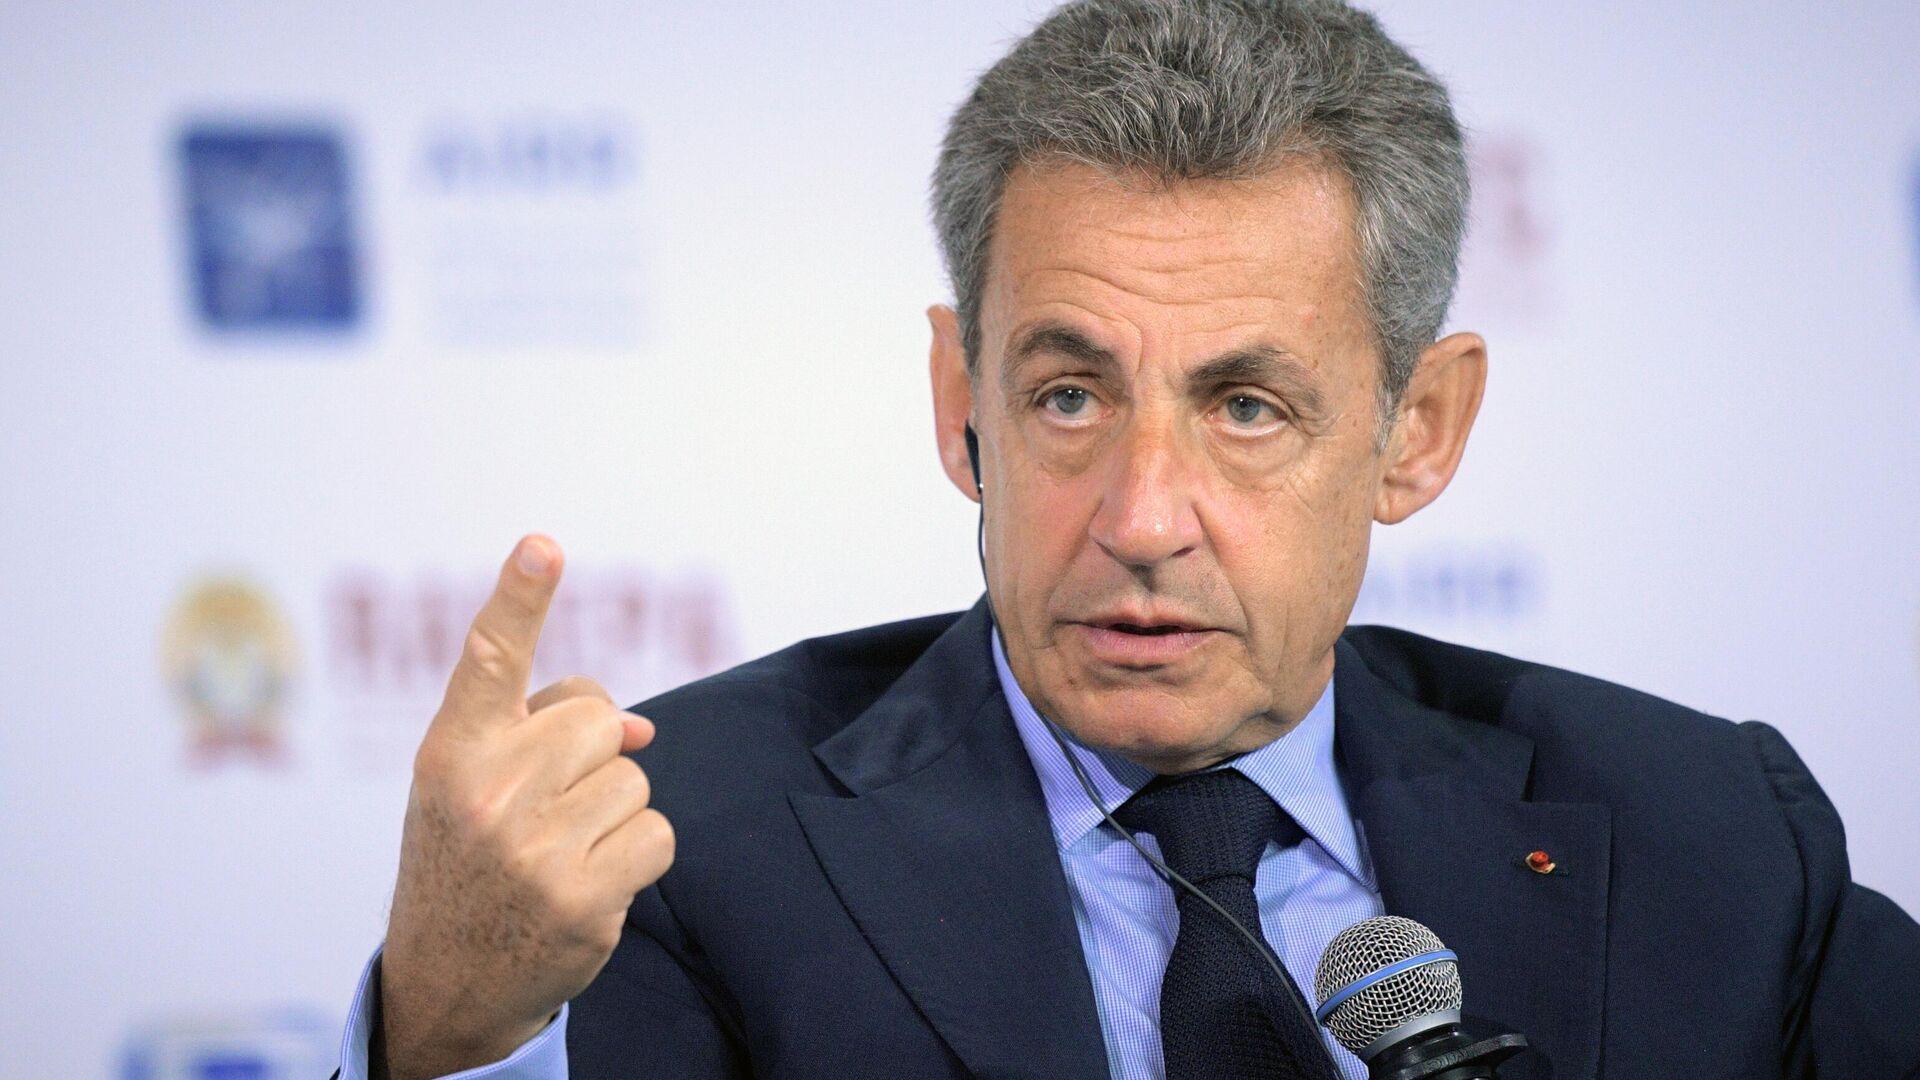 Экс-президент Франции Николя Саркози на XI Гайдаровском форуме в Москве - РИА Новости, 1920, 01.03.2021